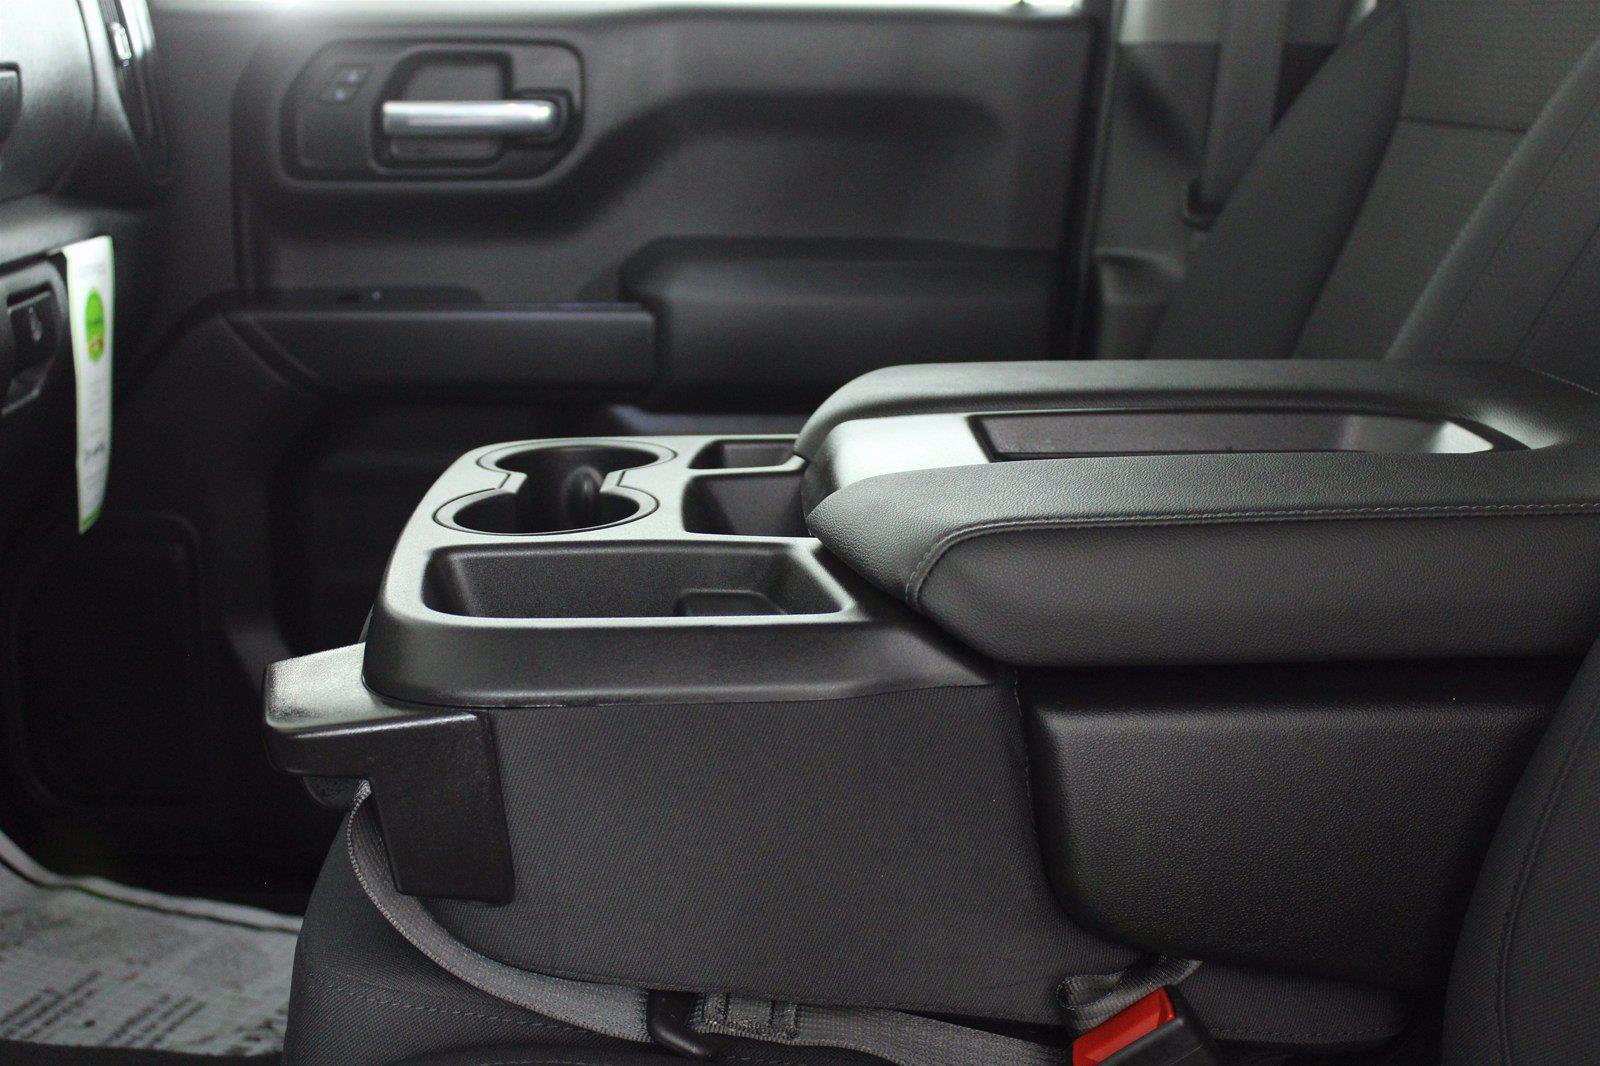 2020 Chevrolet Silverado 1500 Crew Cab 4x4, Pickup #DU90938 - photo 7